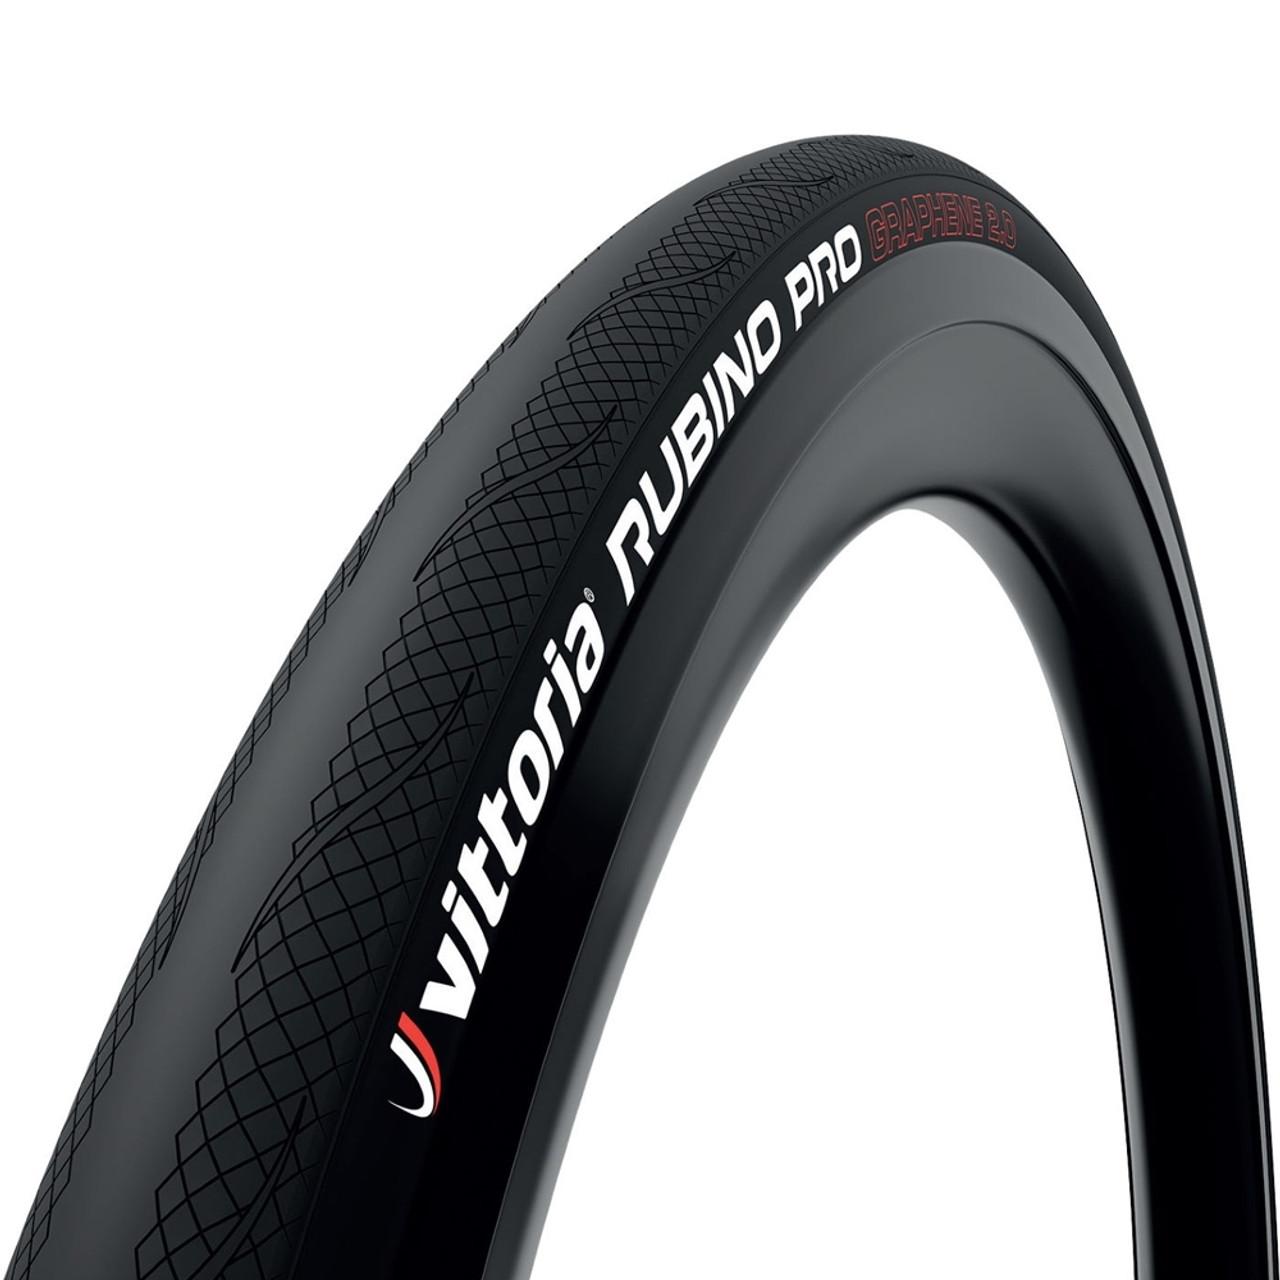 Vittoria Rubino IV G2.0 Folding Road Tyre 700 x 25c